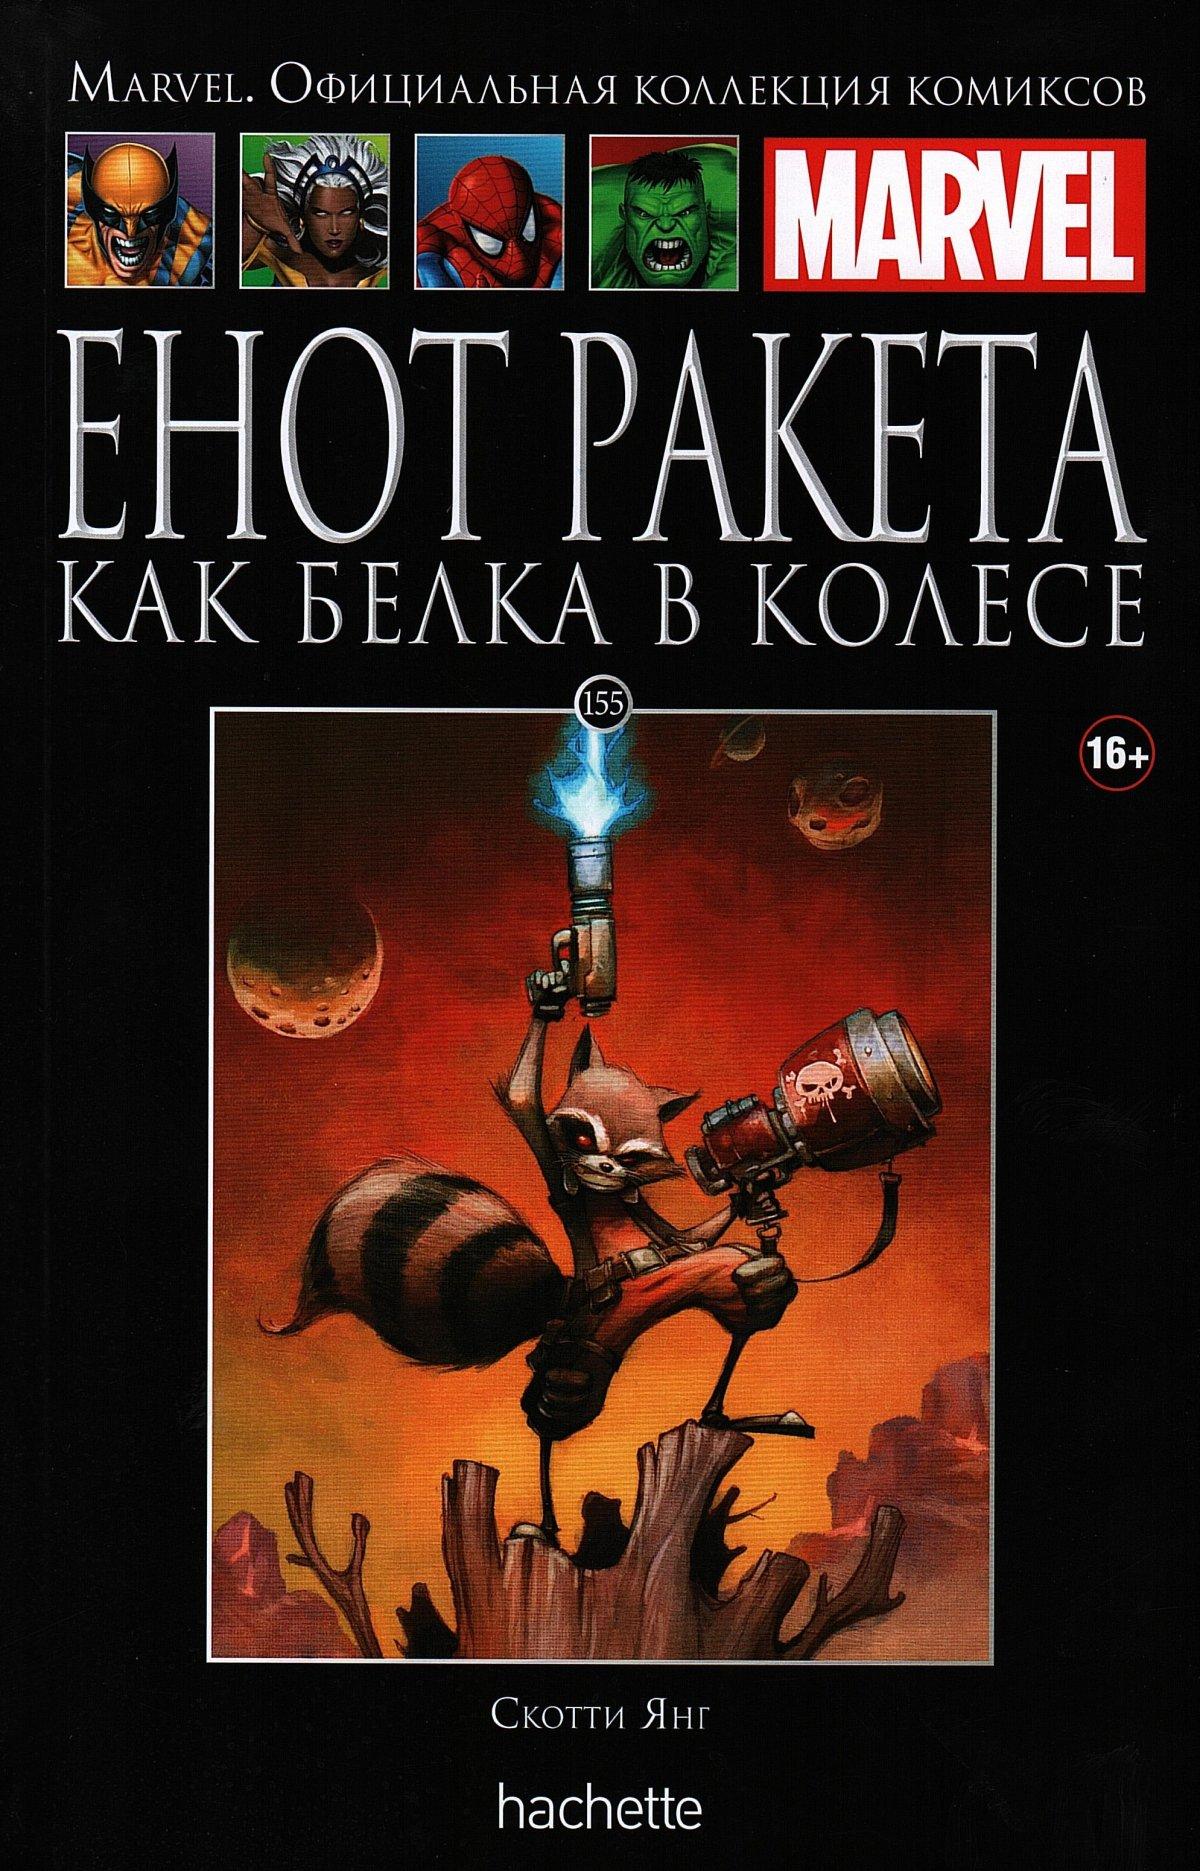 Hachette Официальная коллекция комиксов Marvel: Енот Ракета – Как белка в колесе. Том 155 фото